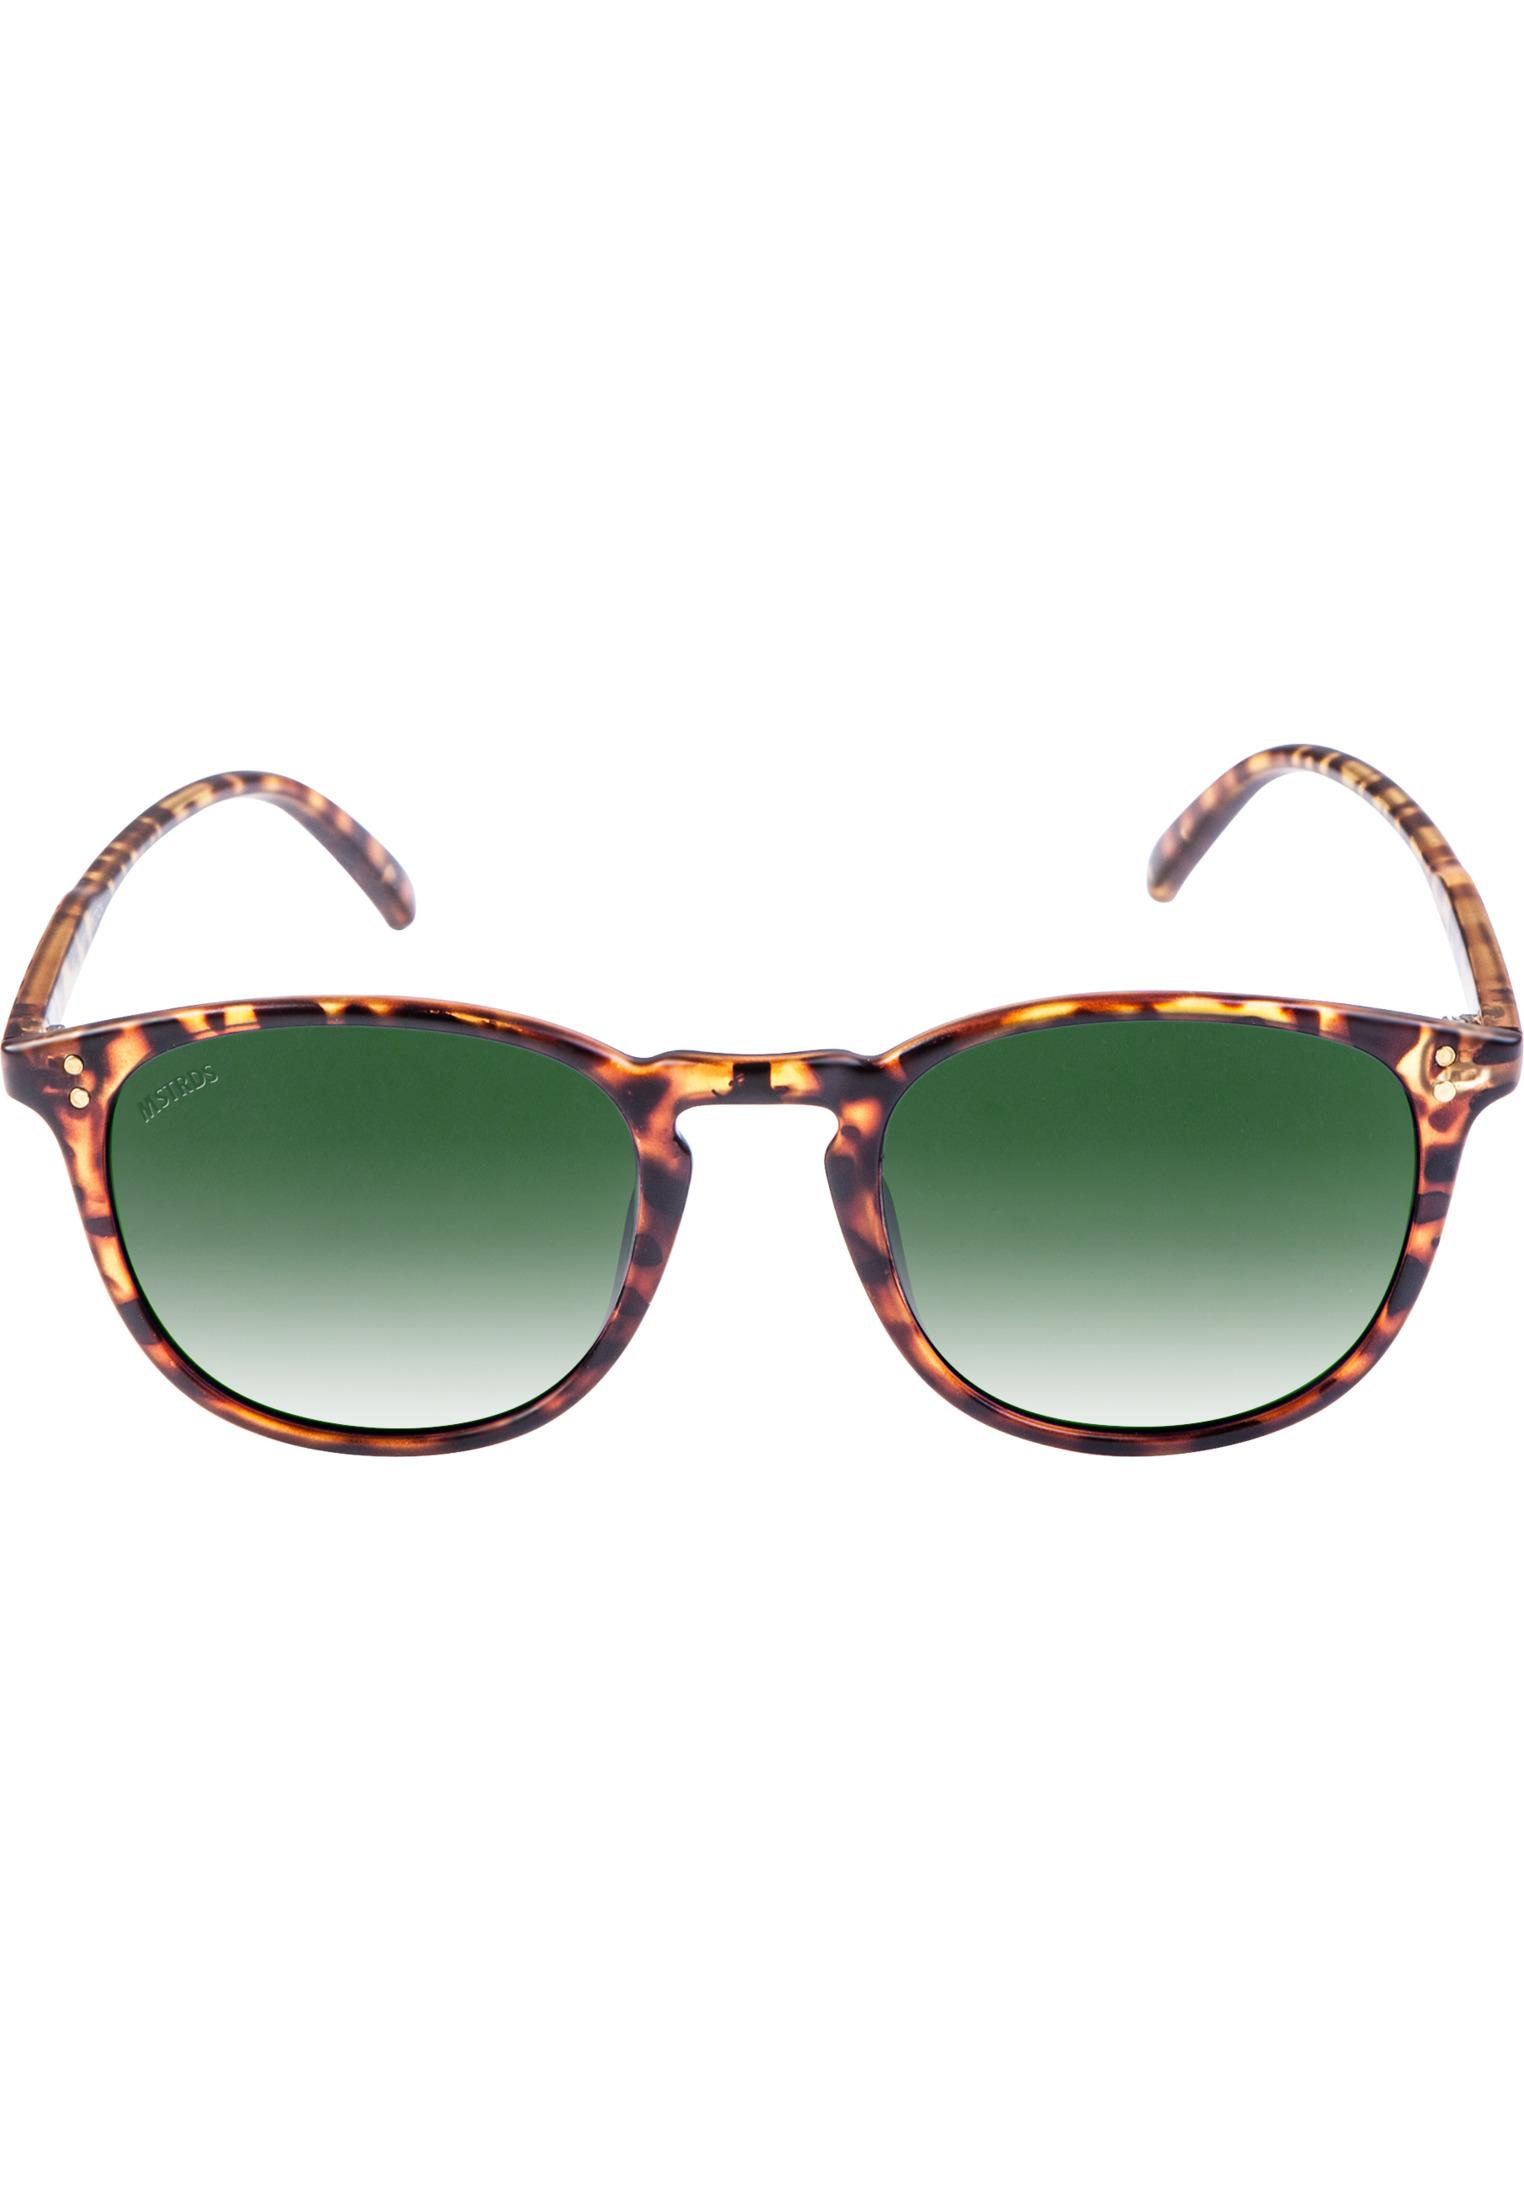 Master Dis Sunglasses Arthur Youth havanna/green - One Size